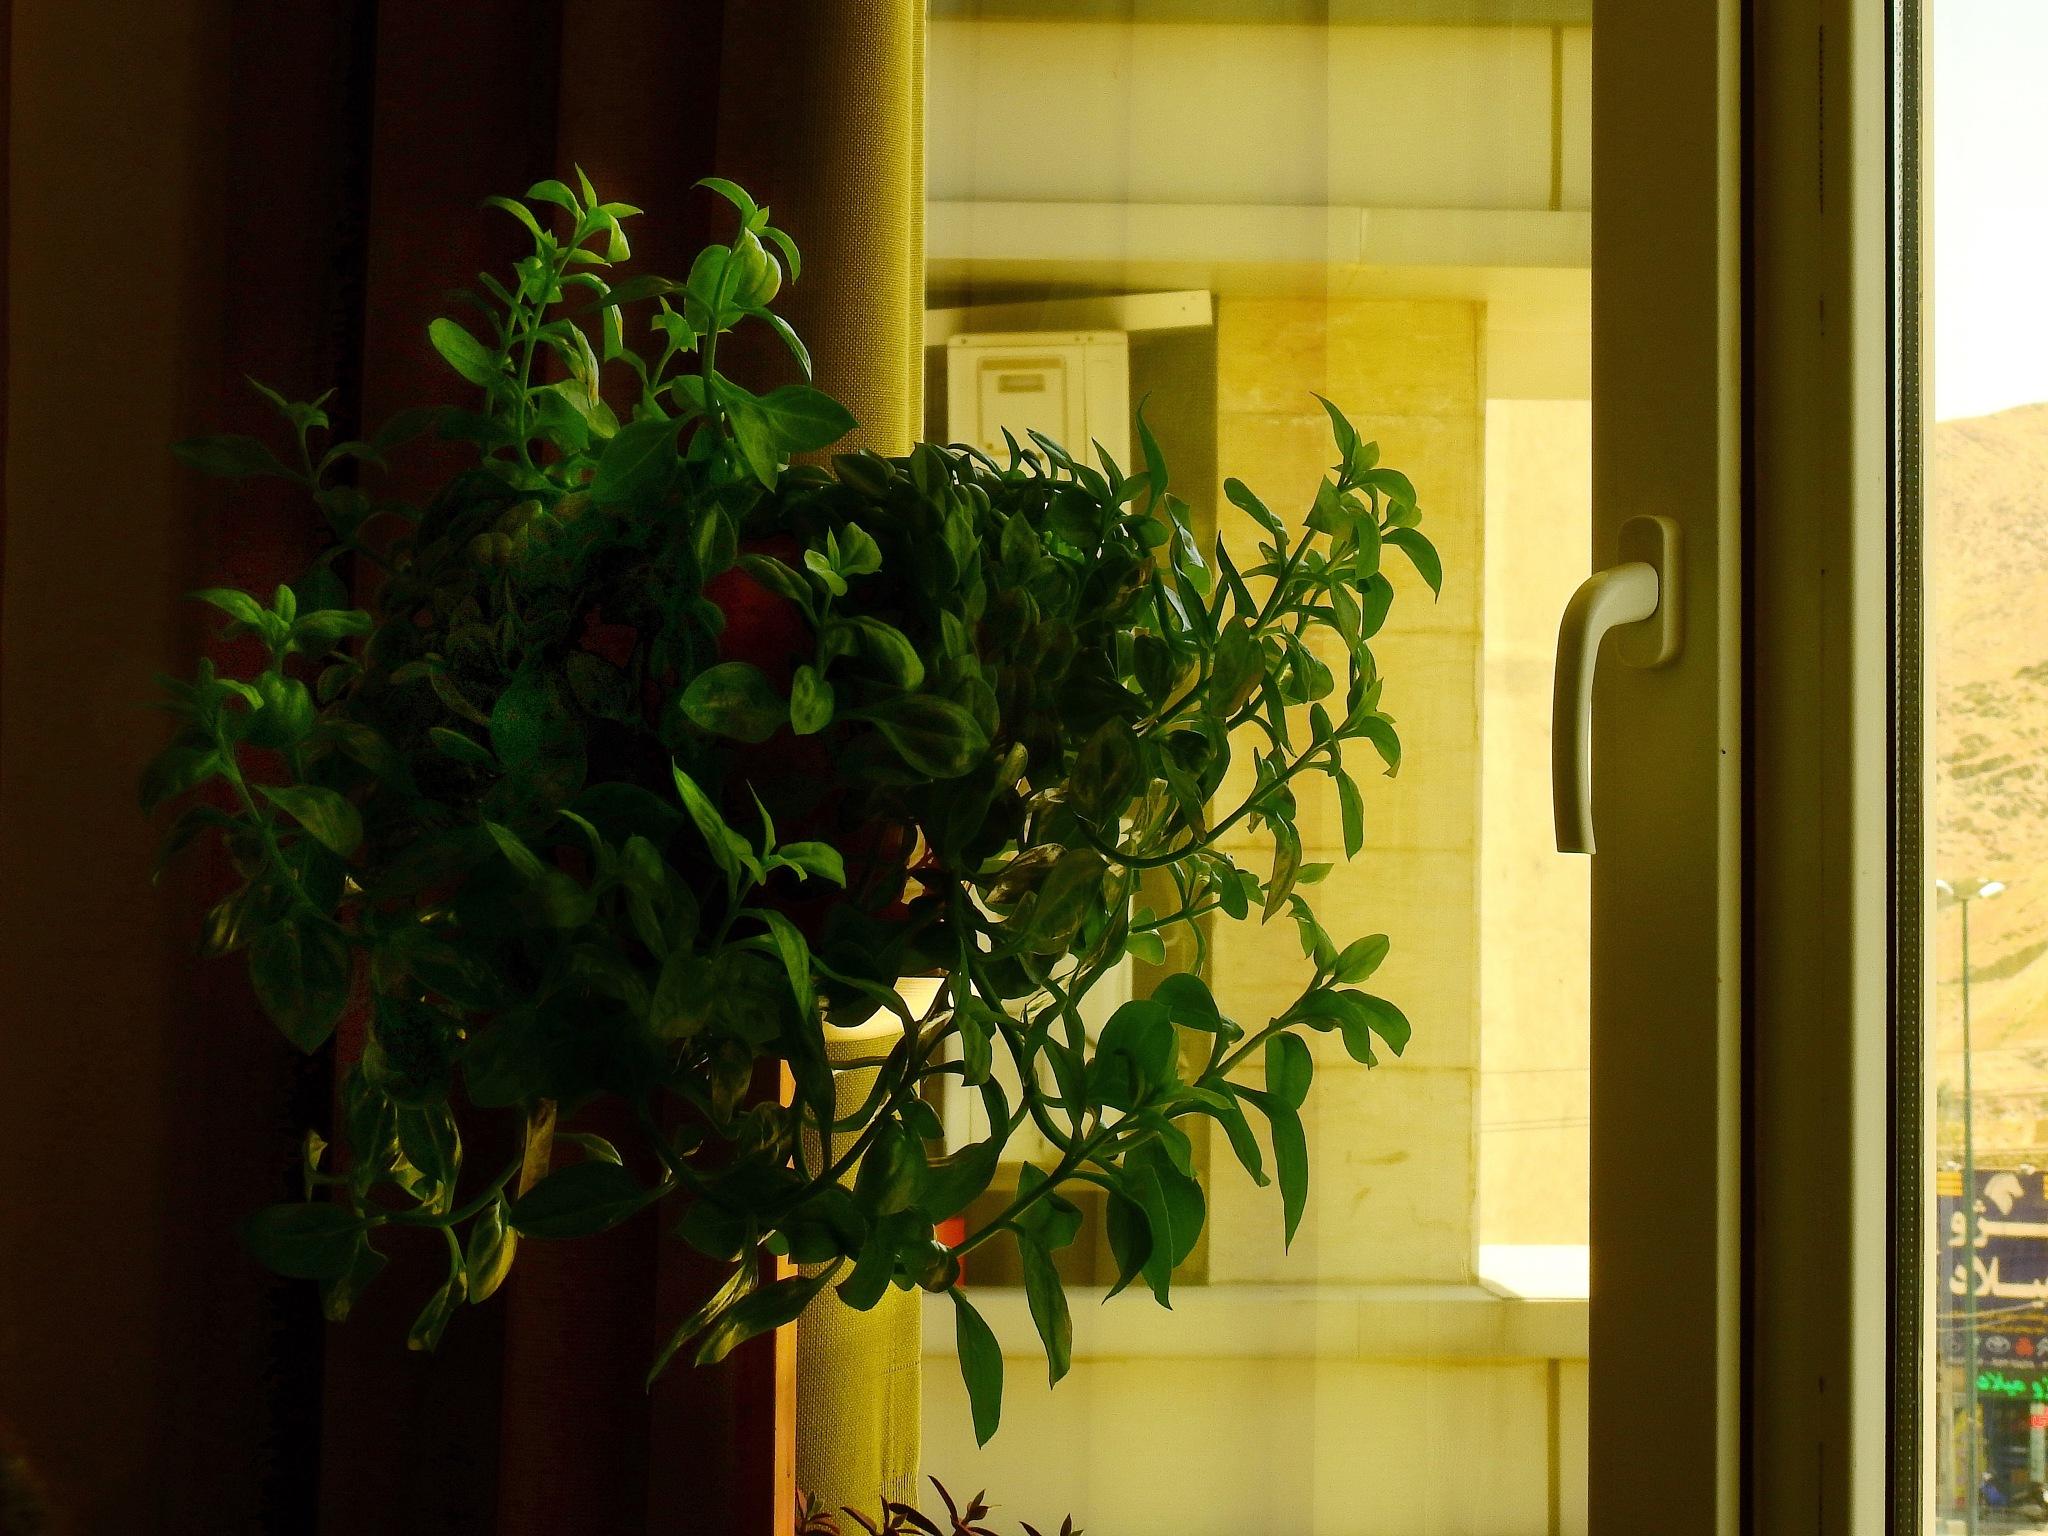 Home by Aahmad Hezavei